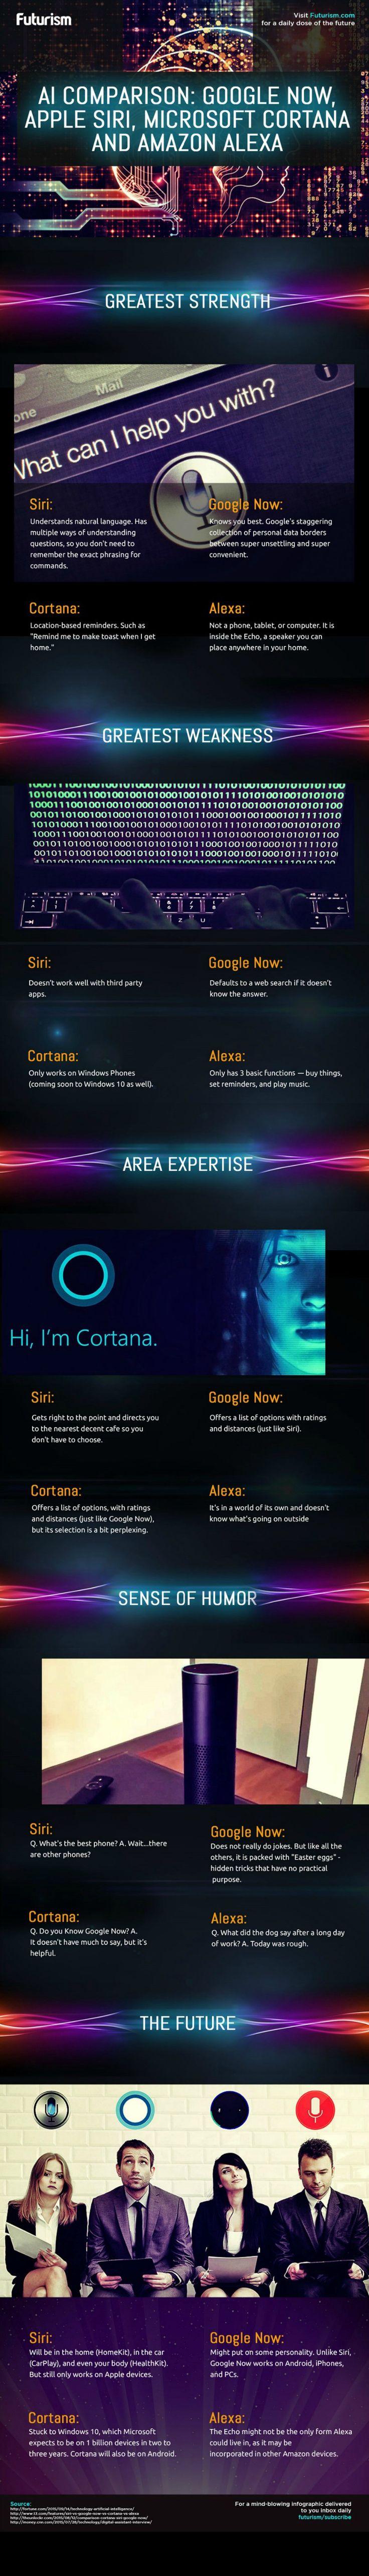 How to make cortana laugh - Best 20 Siri Cortana Ideas On Pinterest Things To Ask Siri Ask Siri And Siri Funny